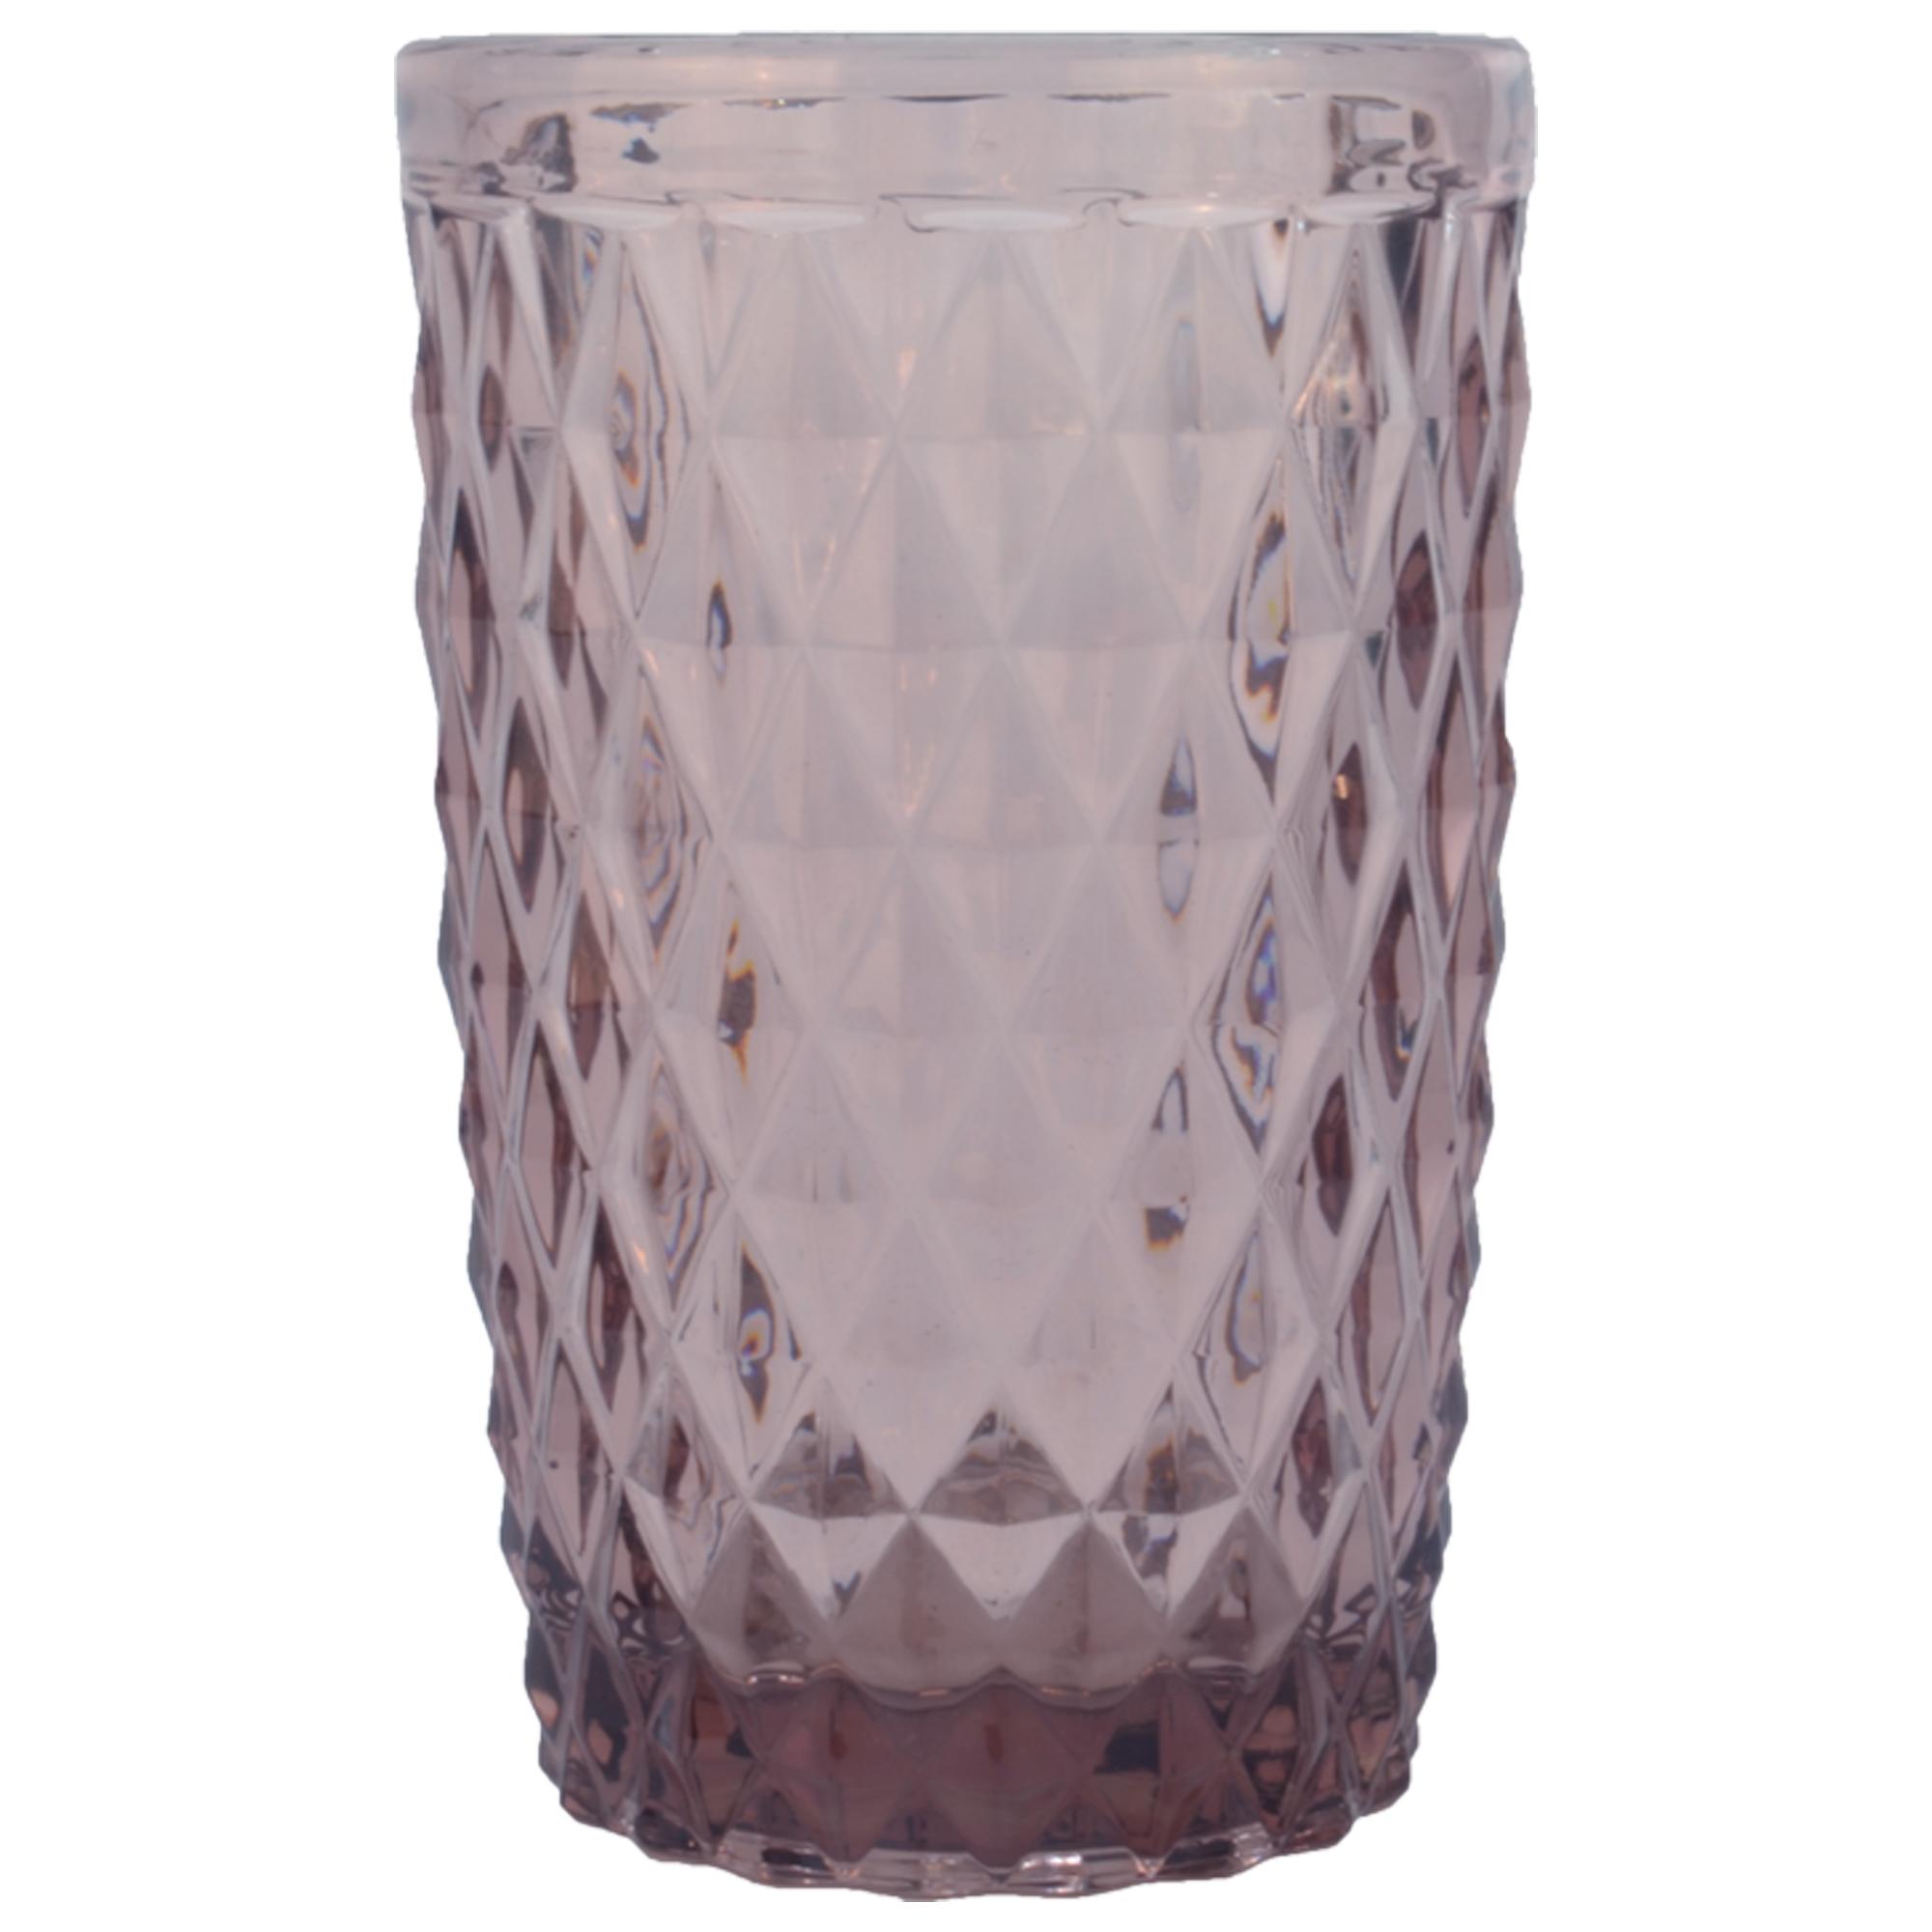 Chope en verre pressé rose 34 cl - Lot de 6